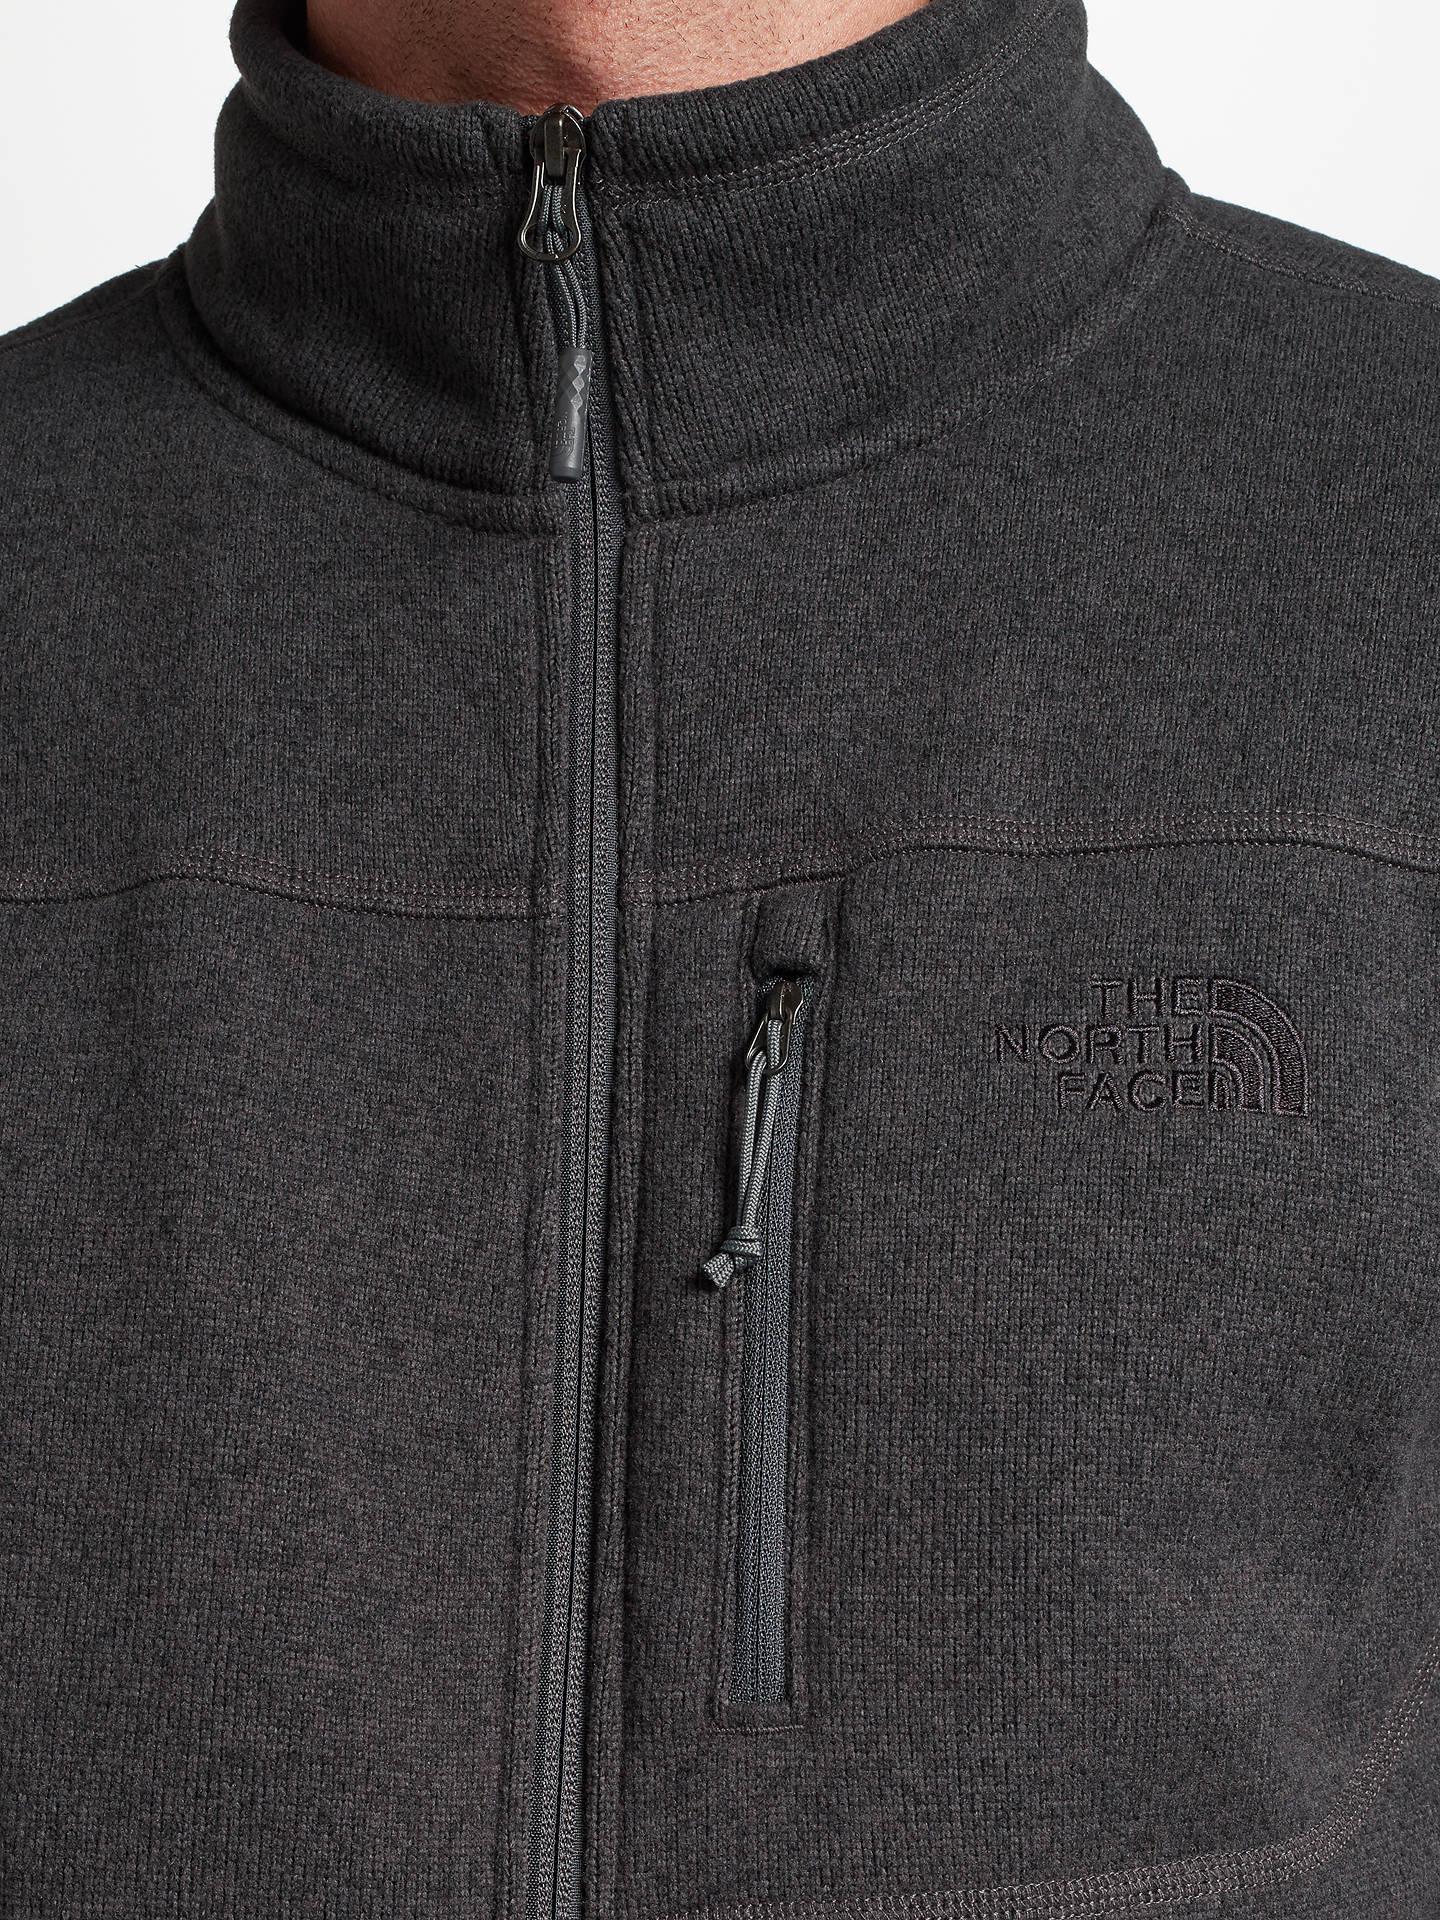 baadb8d81 The North Face Gordon Lyons Full Zip Men's Fleece Jacket, Grey at ...